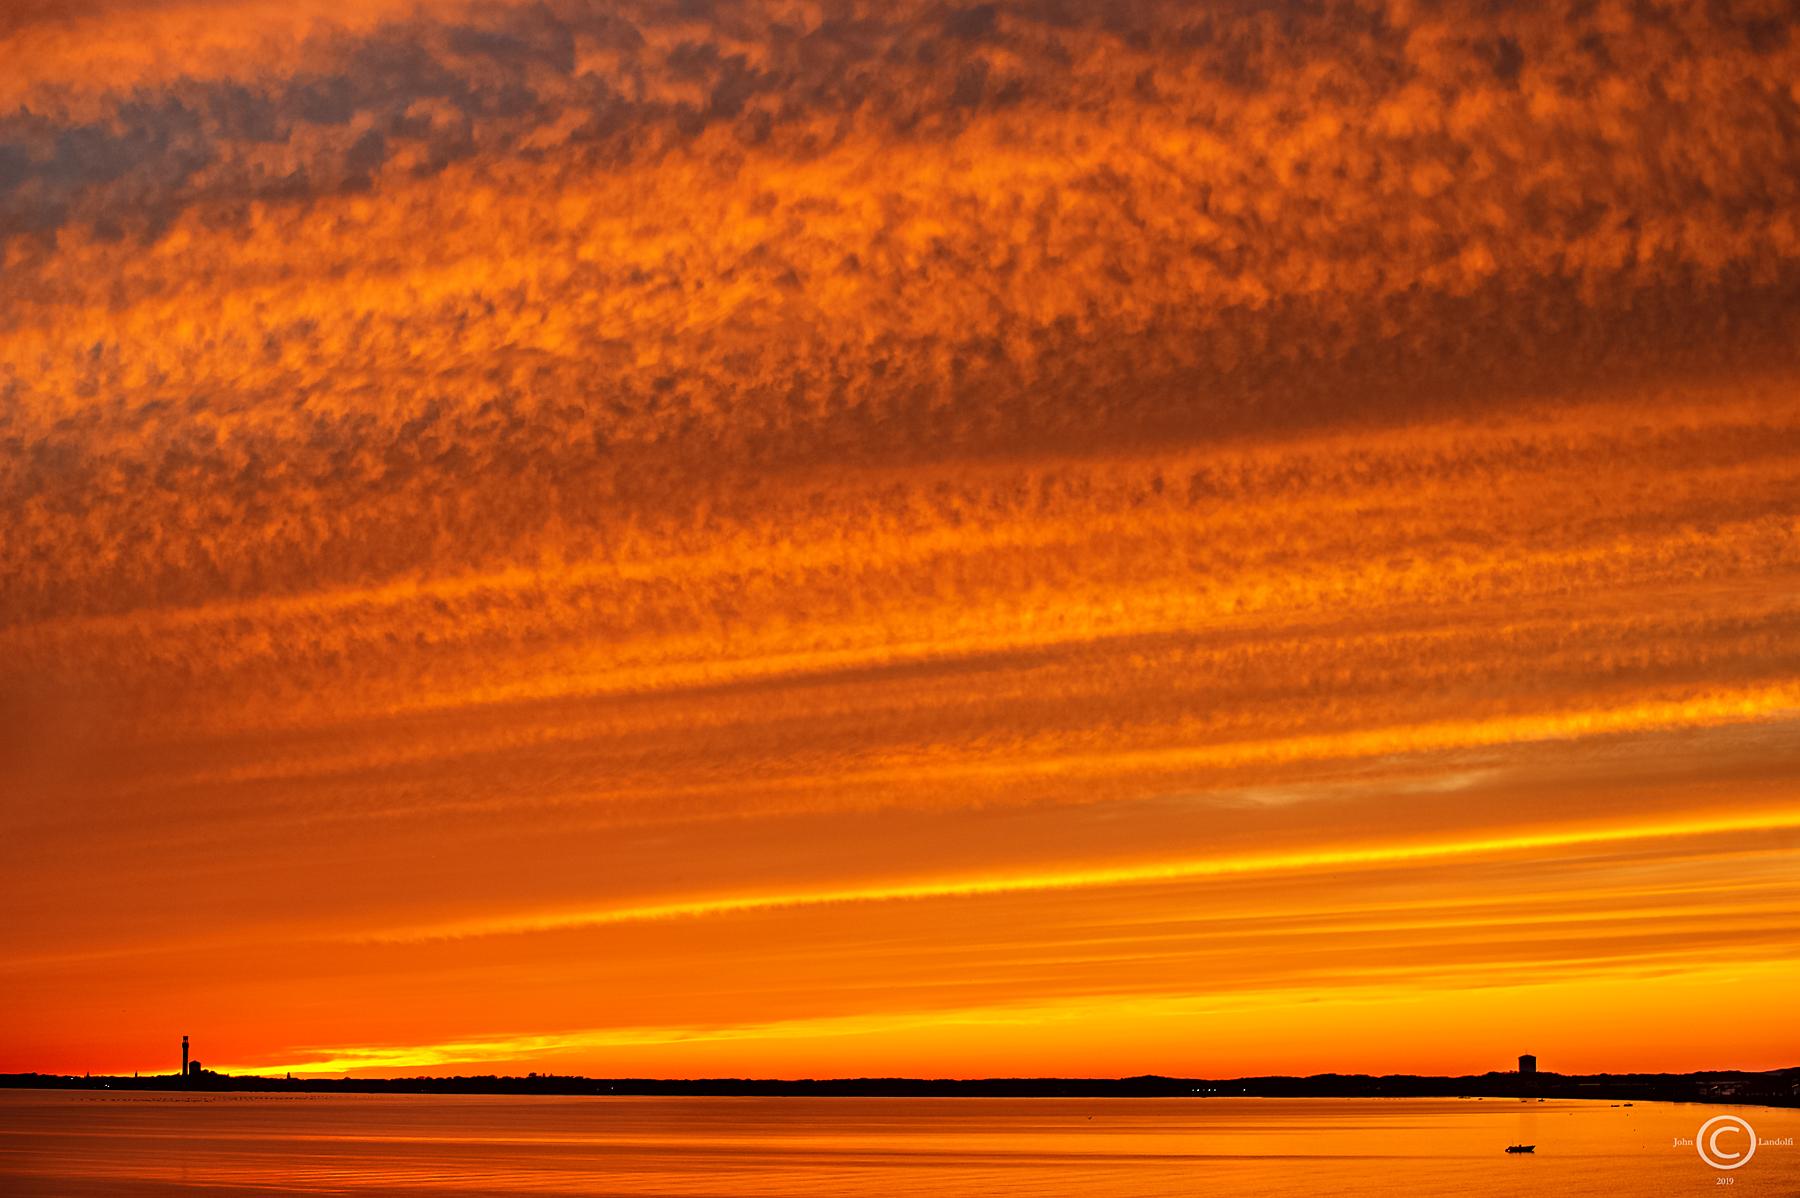 Cape-Cod-2019-Sunset-No2